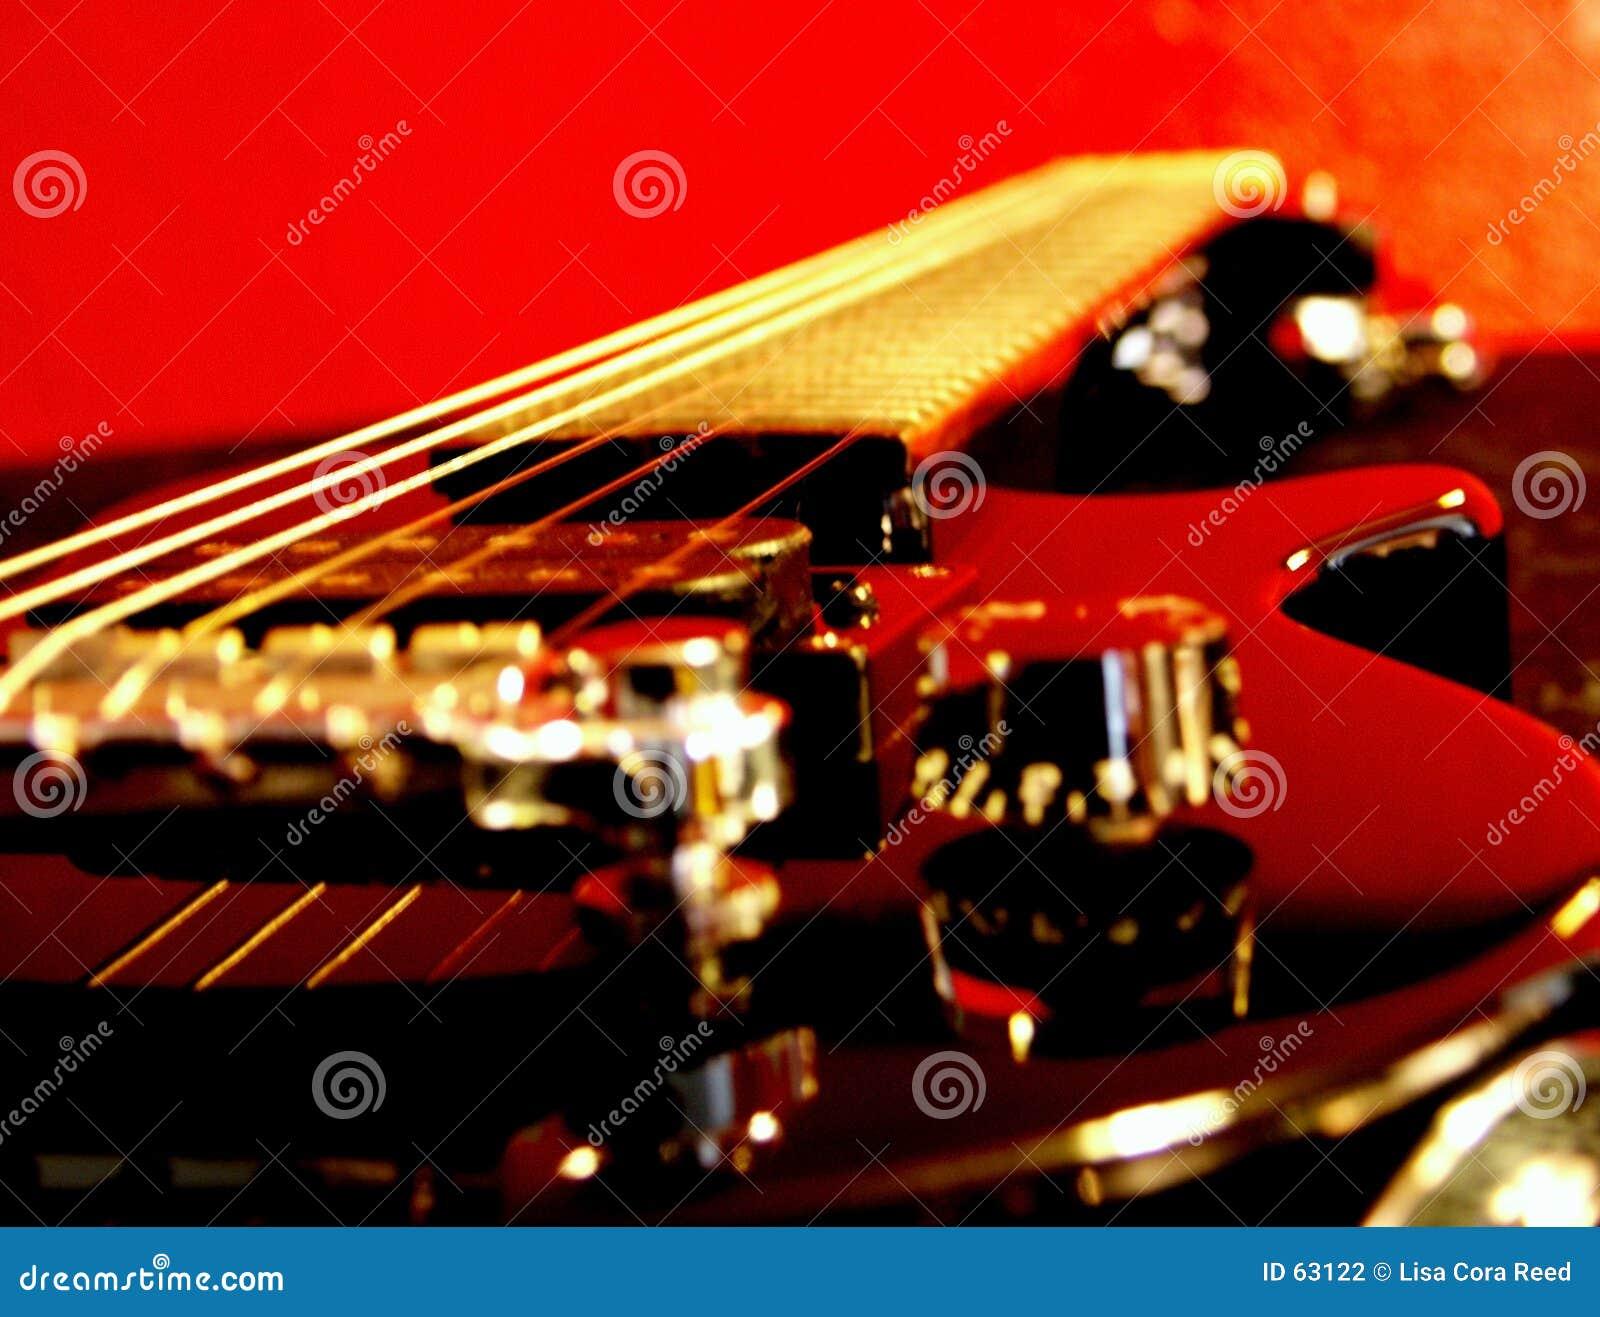 Download συμβολοσειρά έξι στοκ εικόνες. εικόνα από μουσικός, συμβολοσειρές - 63122